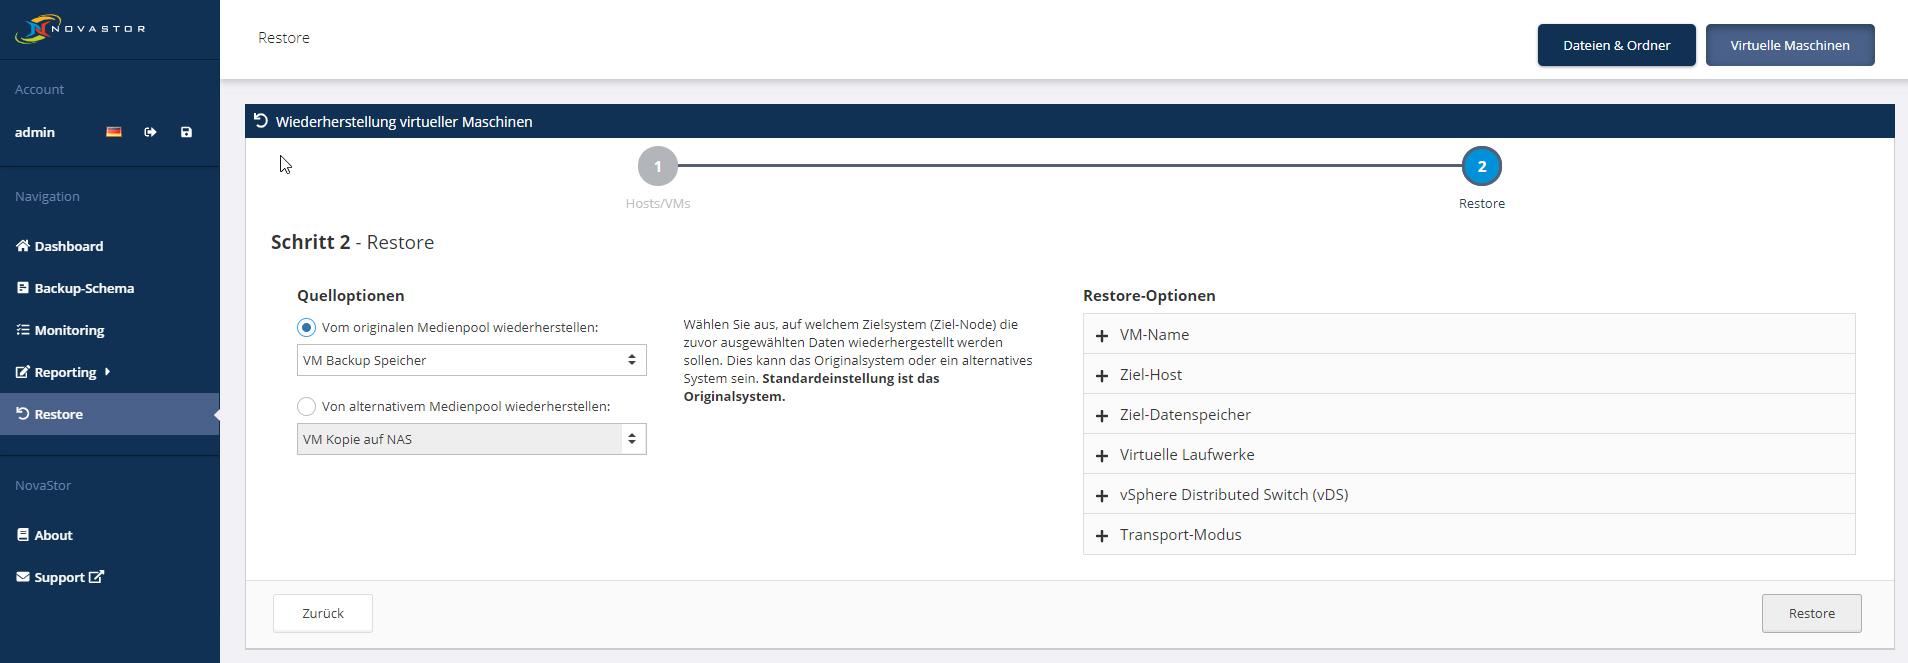 NovaStor DataCenter - VM Restore #2